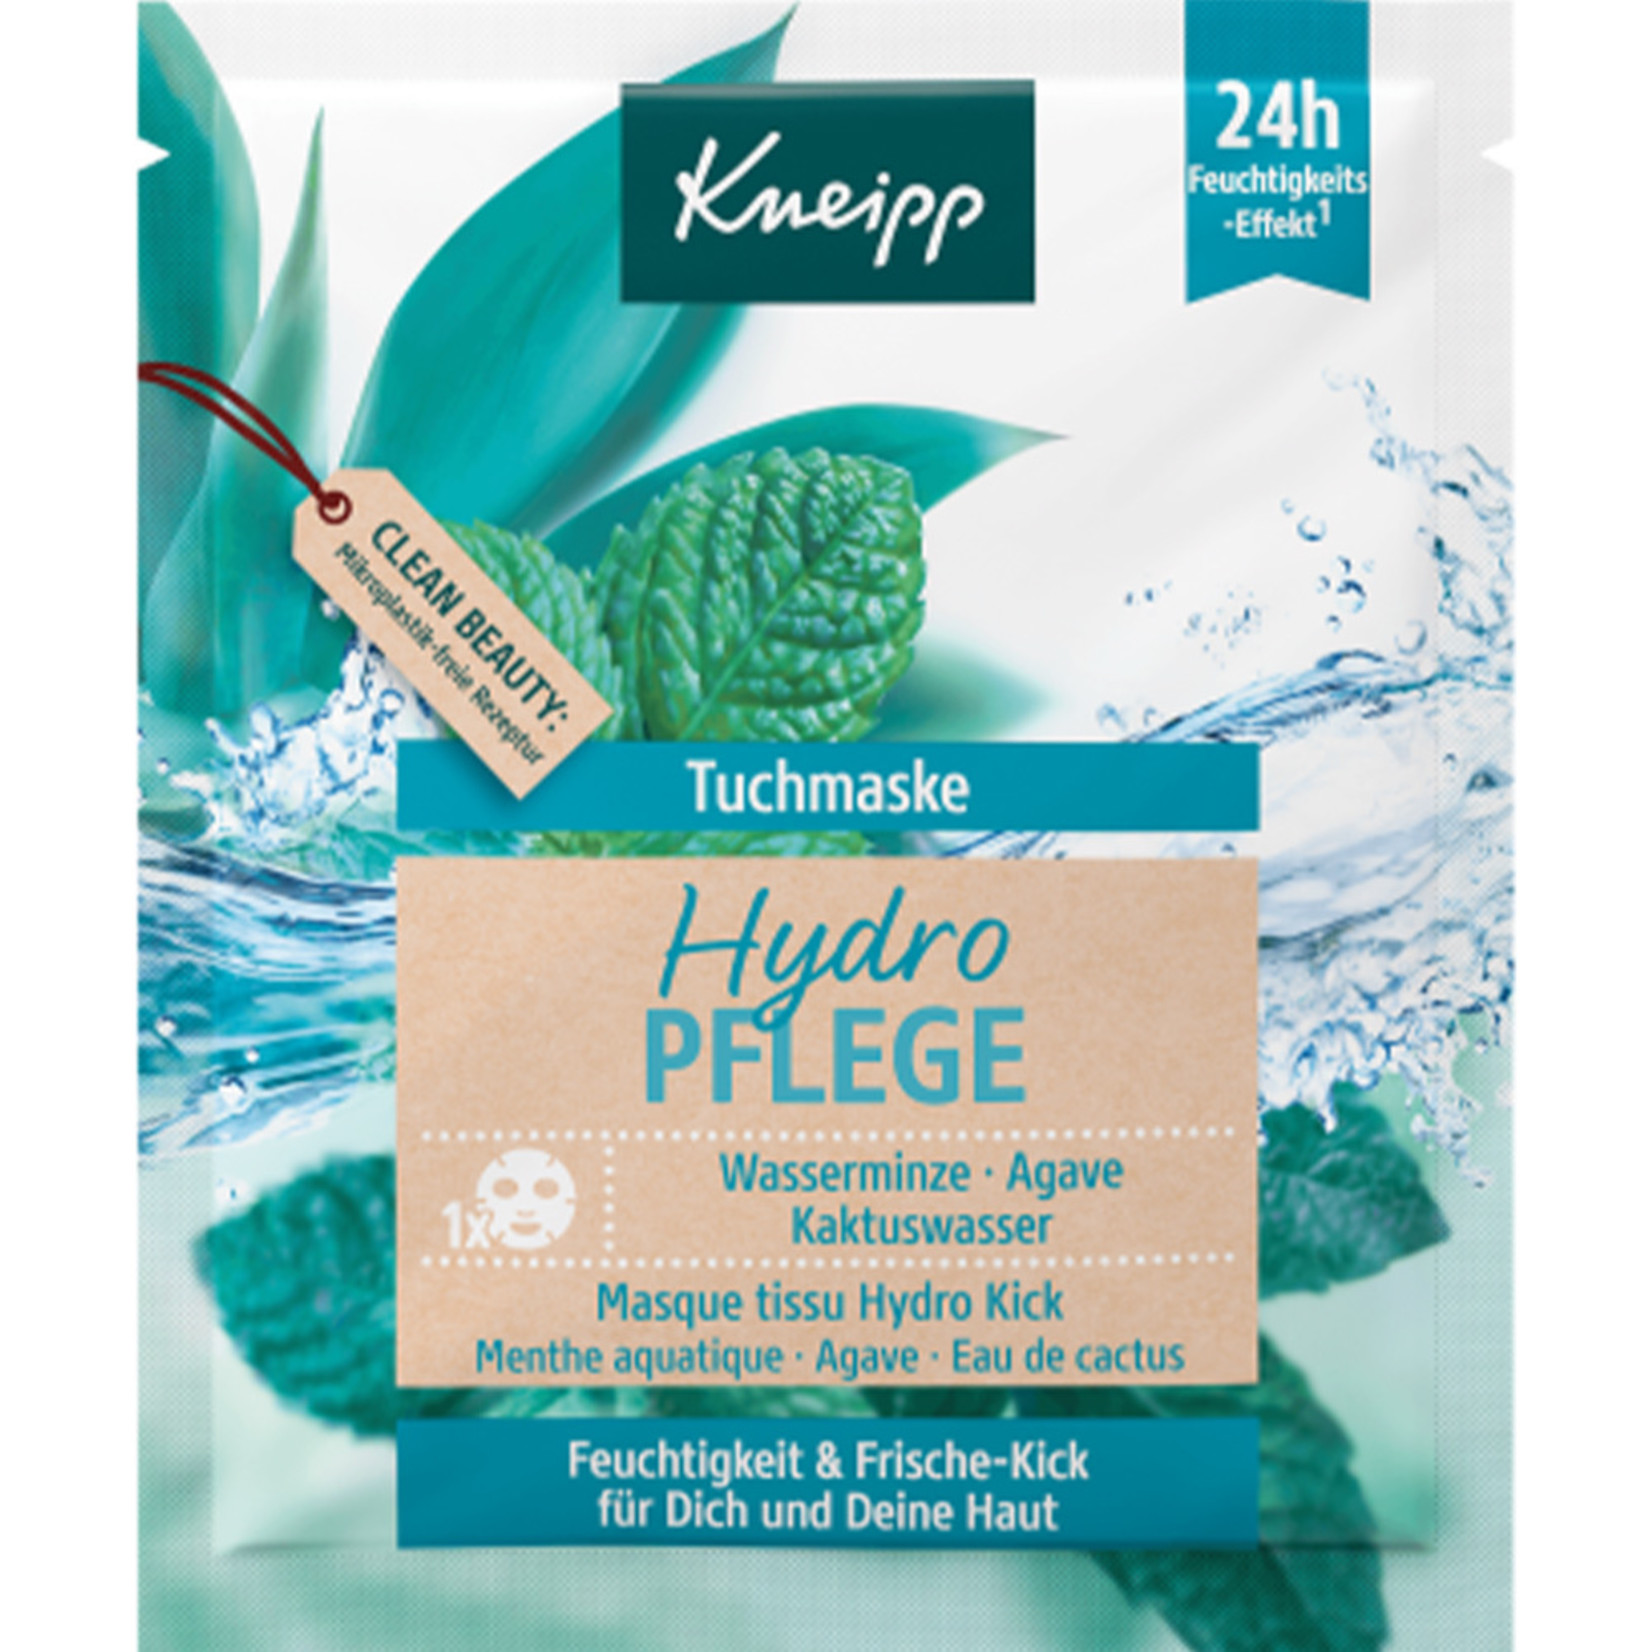 Kneipp Hydro Care Sheet Mask